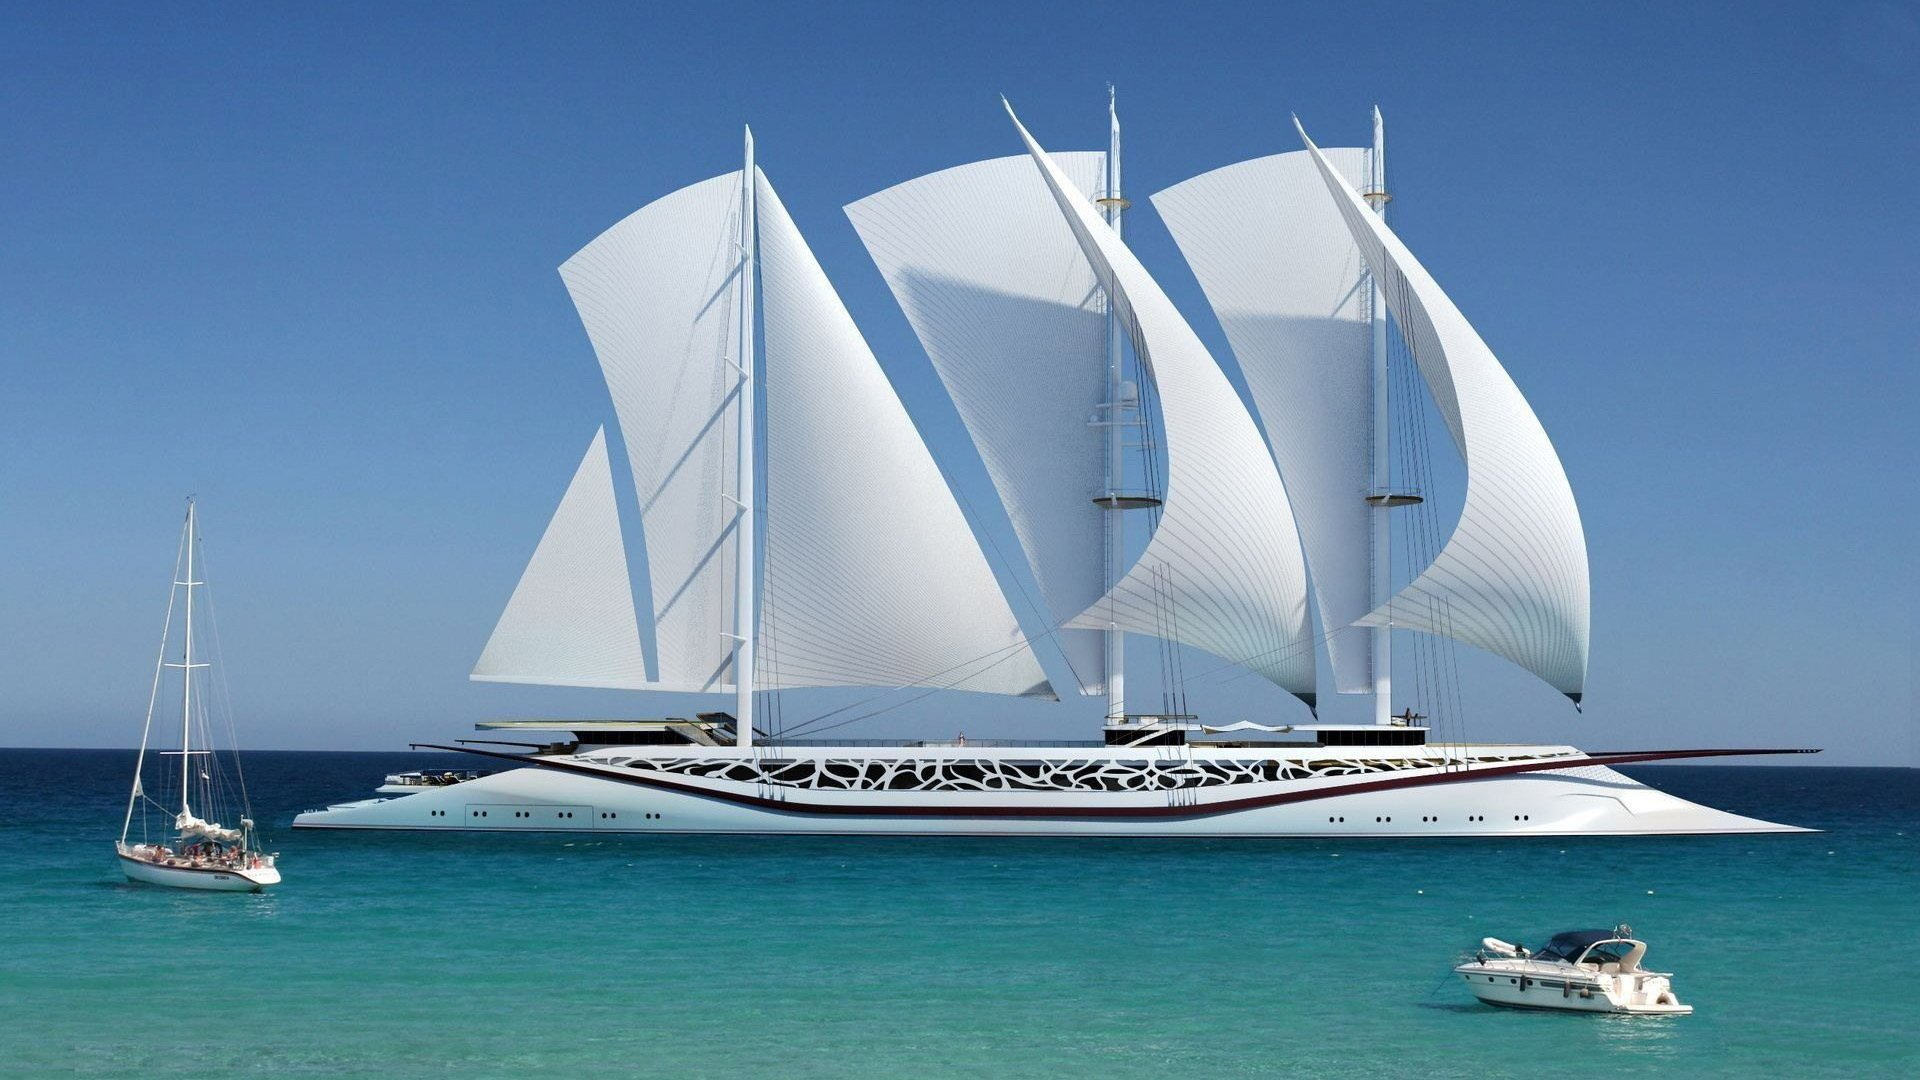 Super Yachts Hd Wallpaper